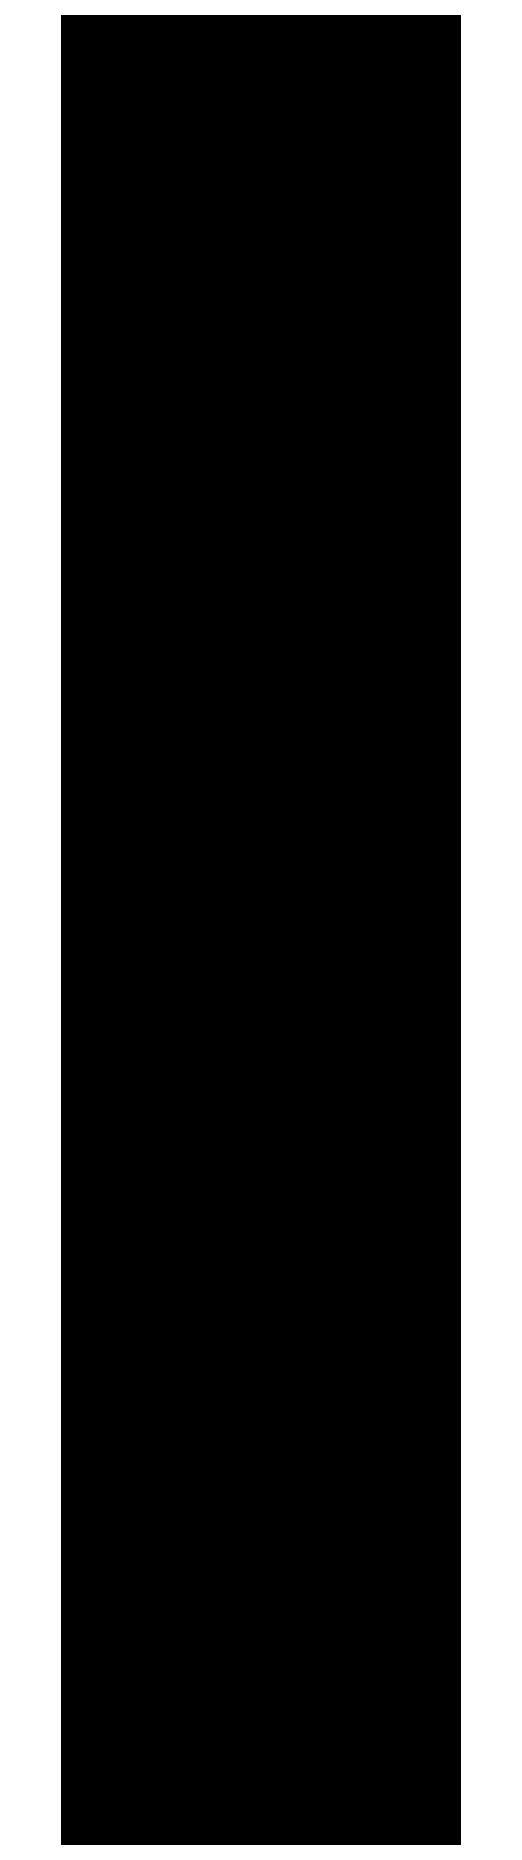 Friksiyon Testereler